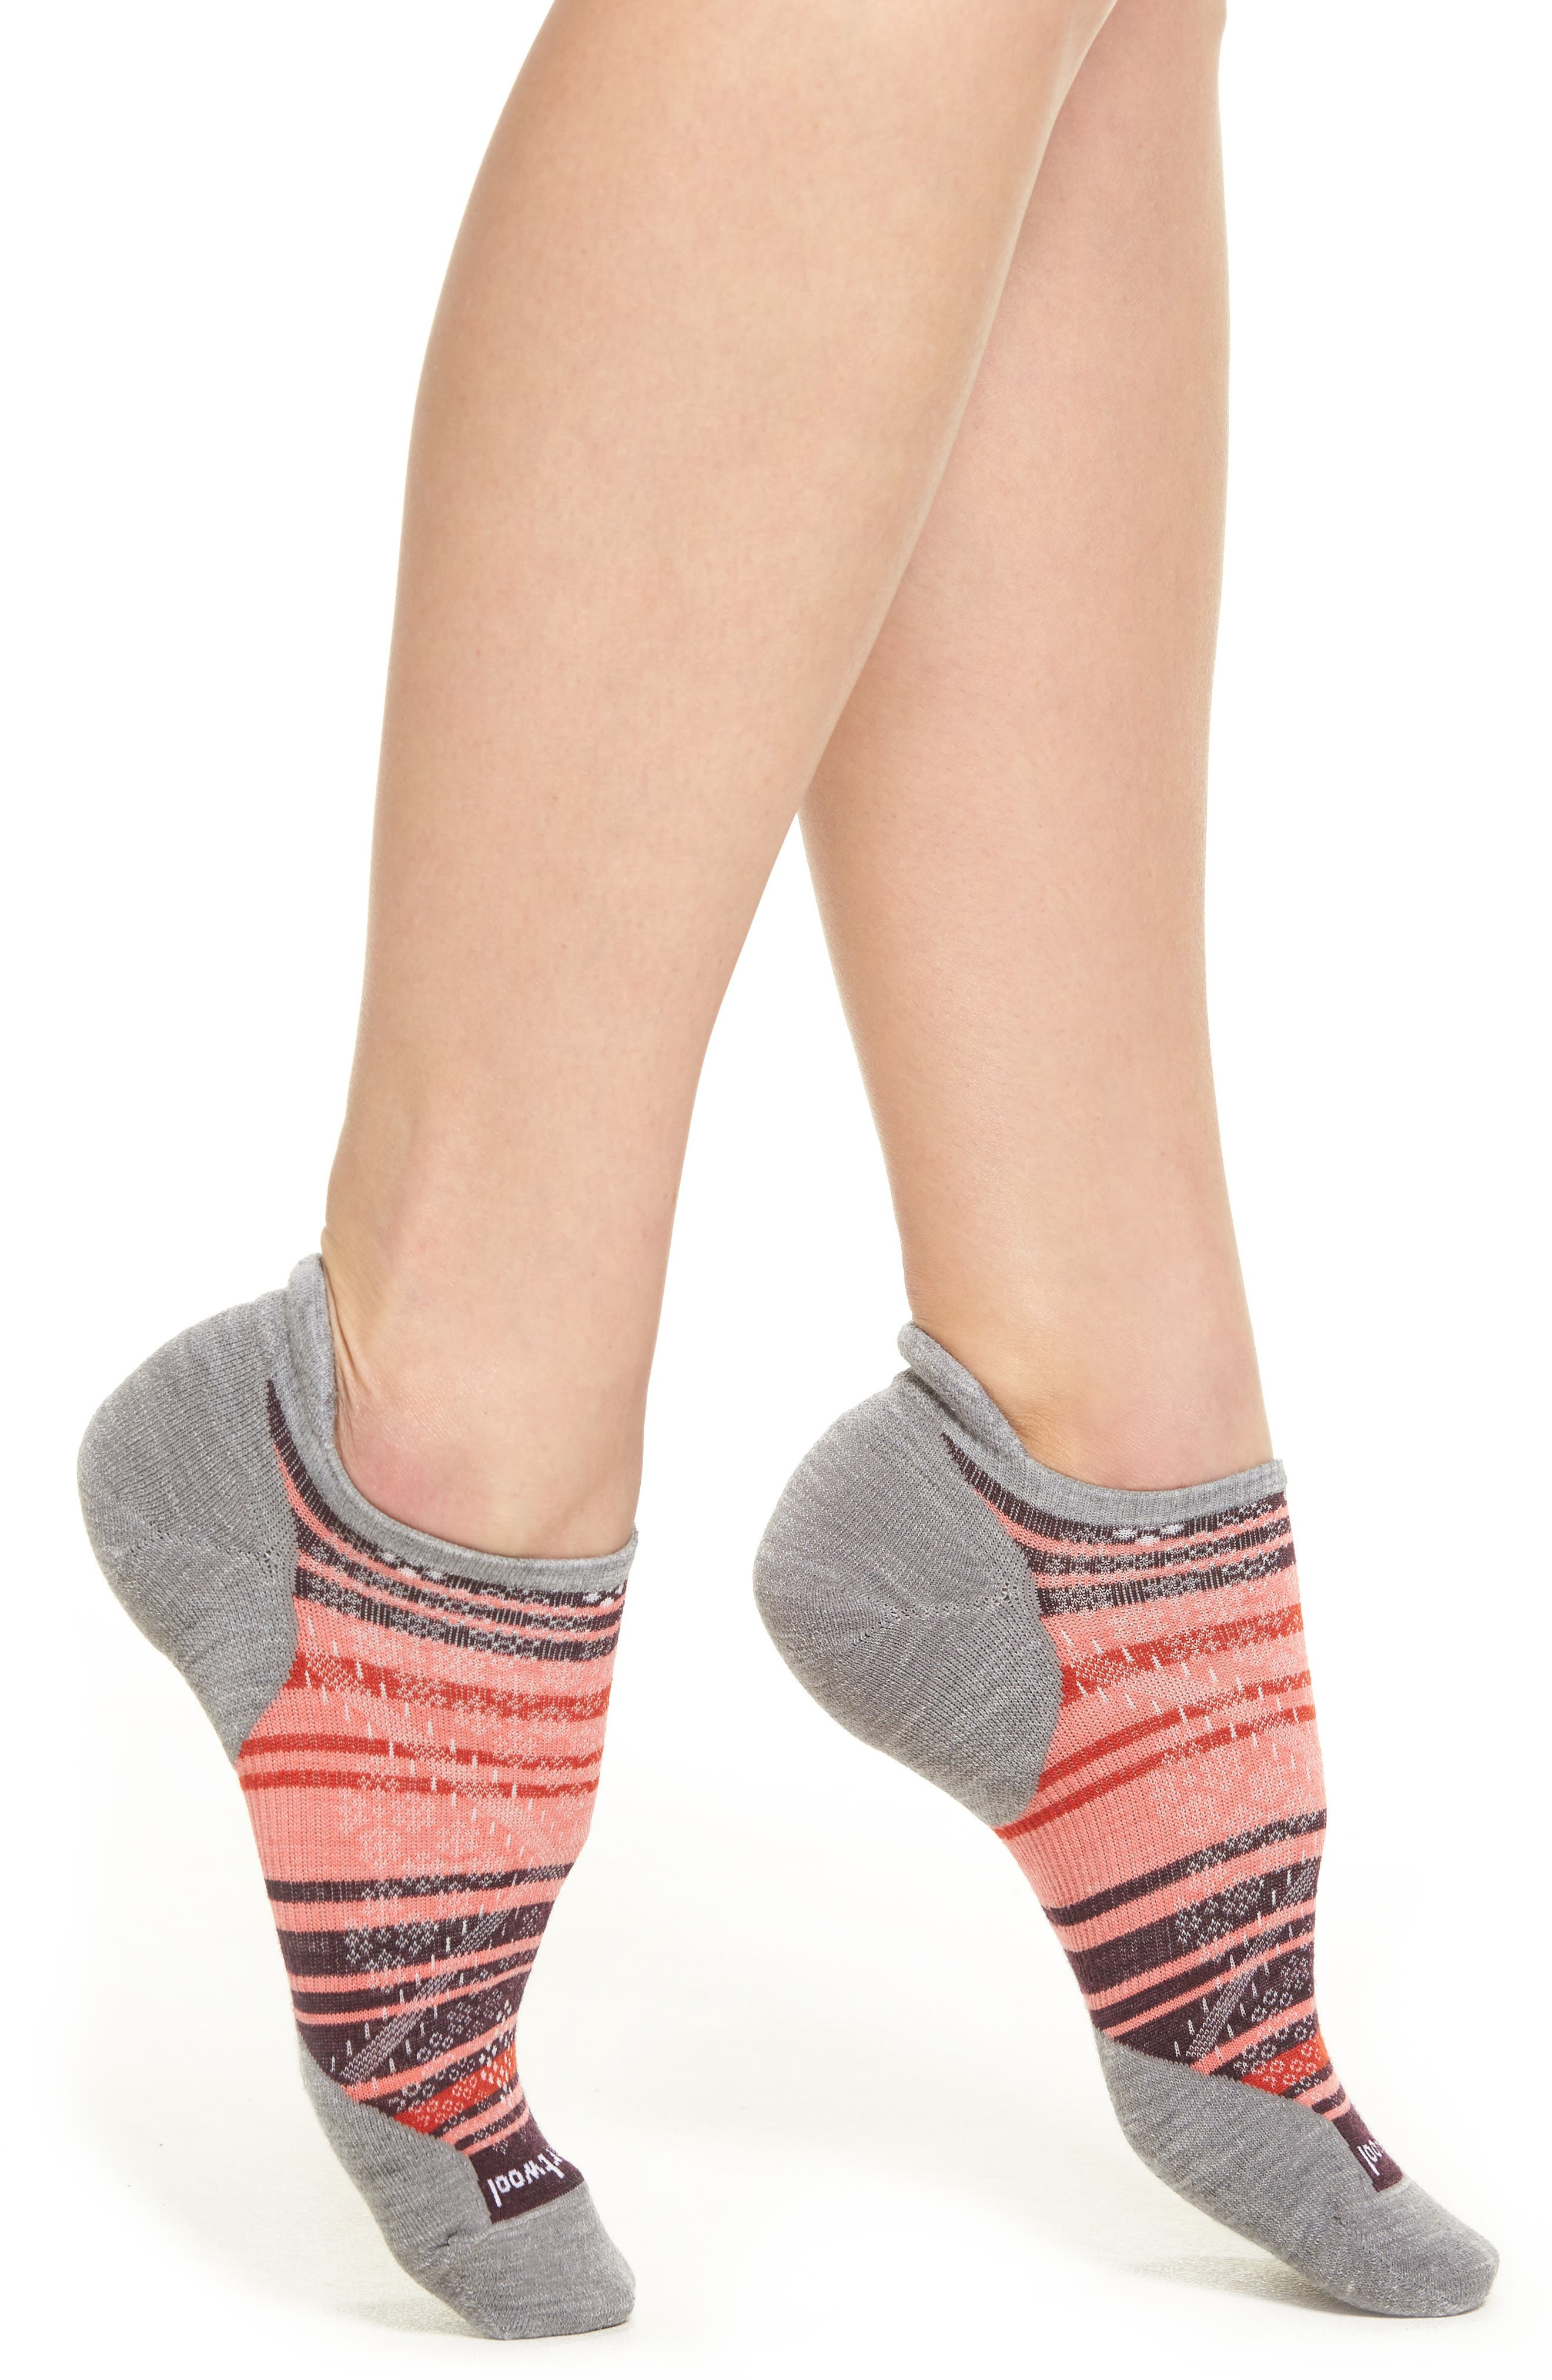 PhD Run Elite Micro No-Show Socks,                             Main thumbnail 1, color,                             050